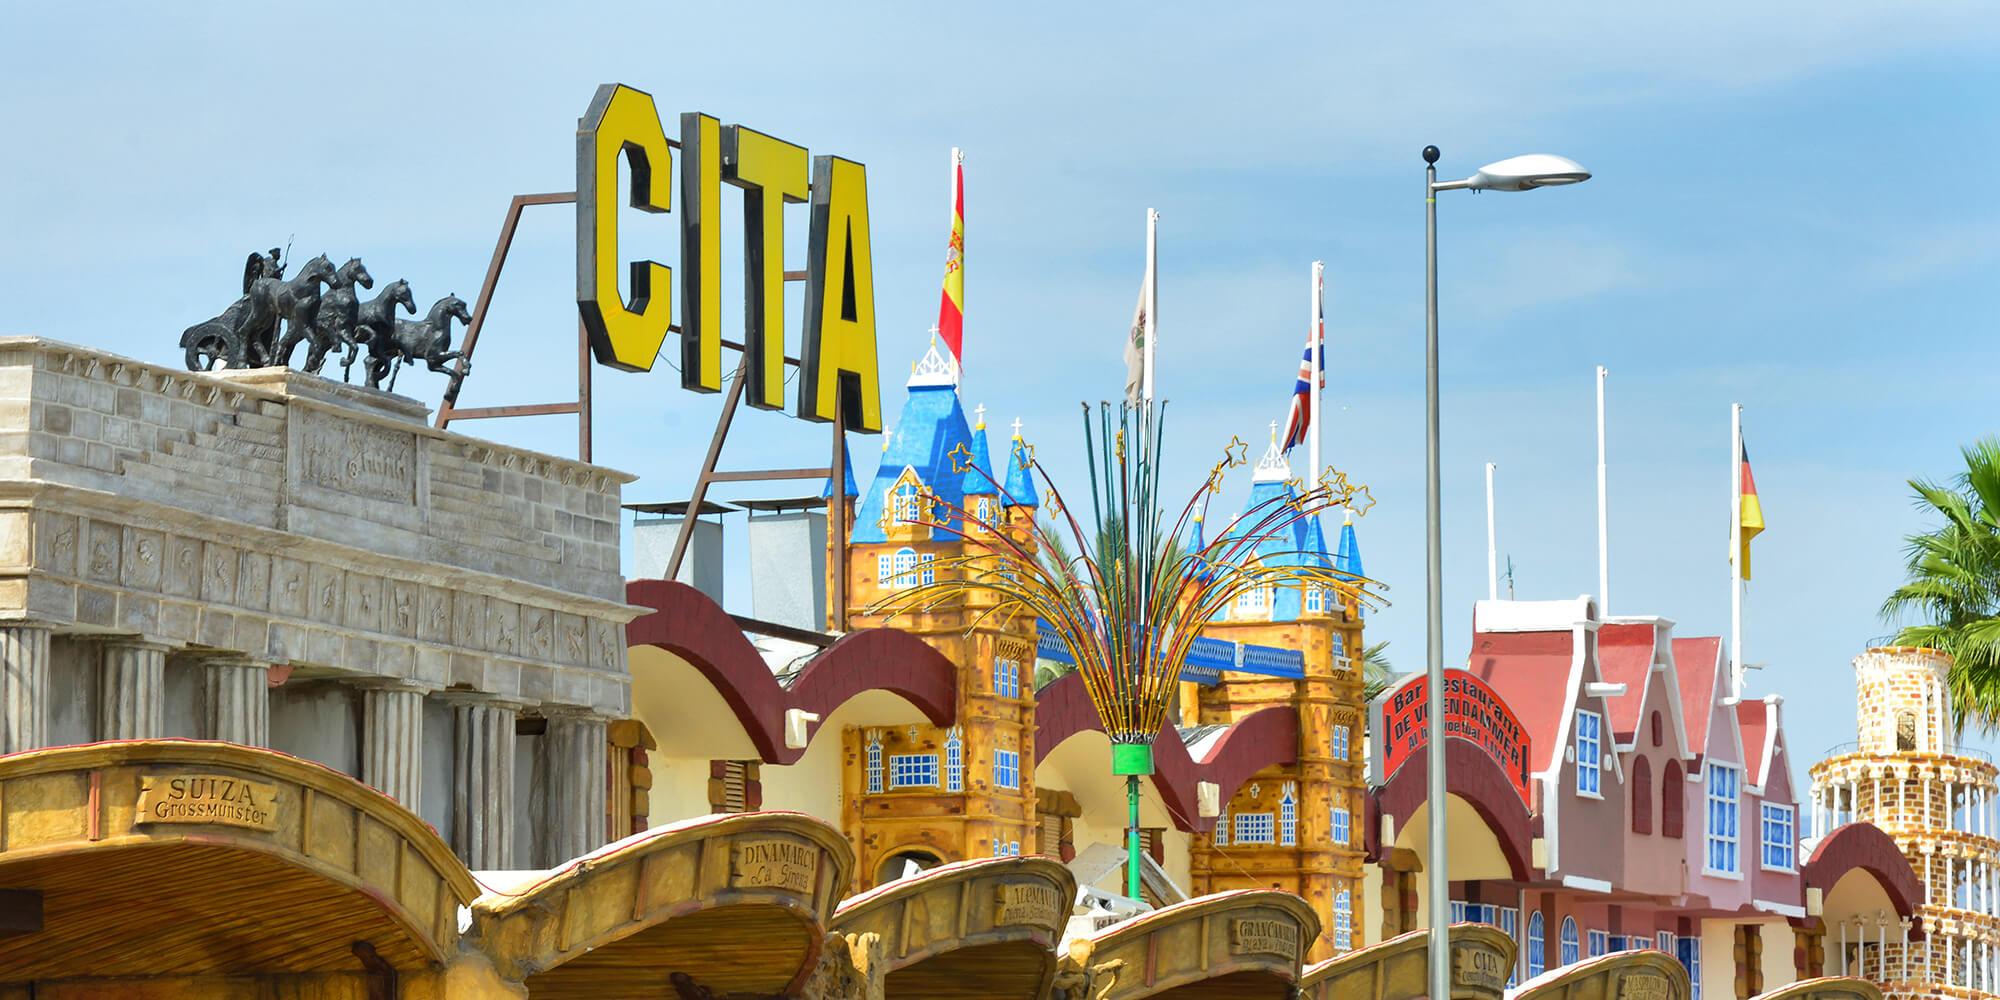 GranCanariaFoto-Cita-Playa-del-Ingles-Dirk-Holst-DHSTUDIO-165